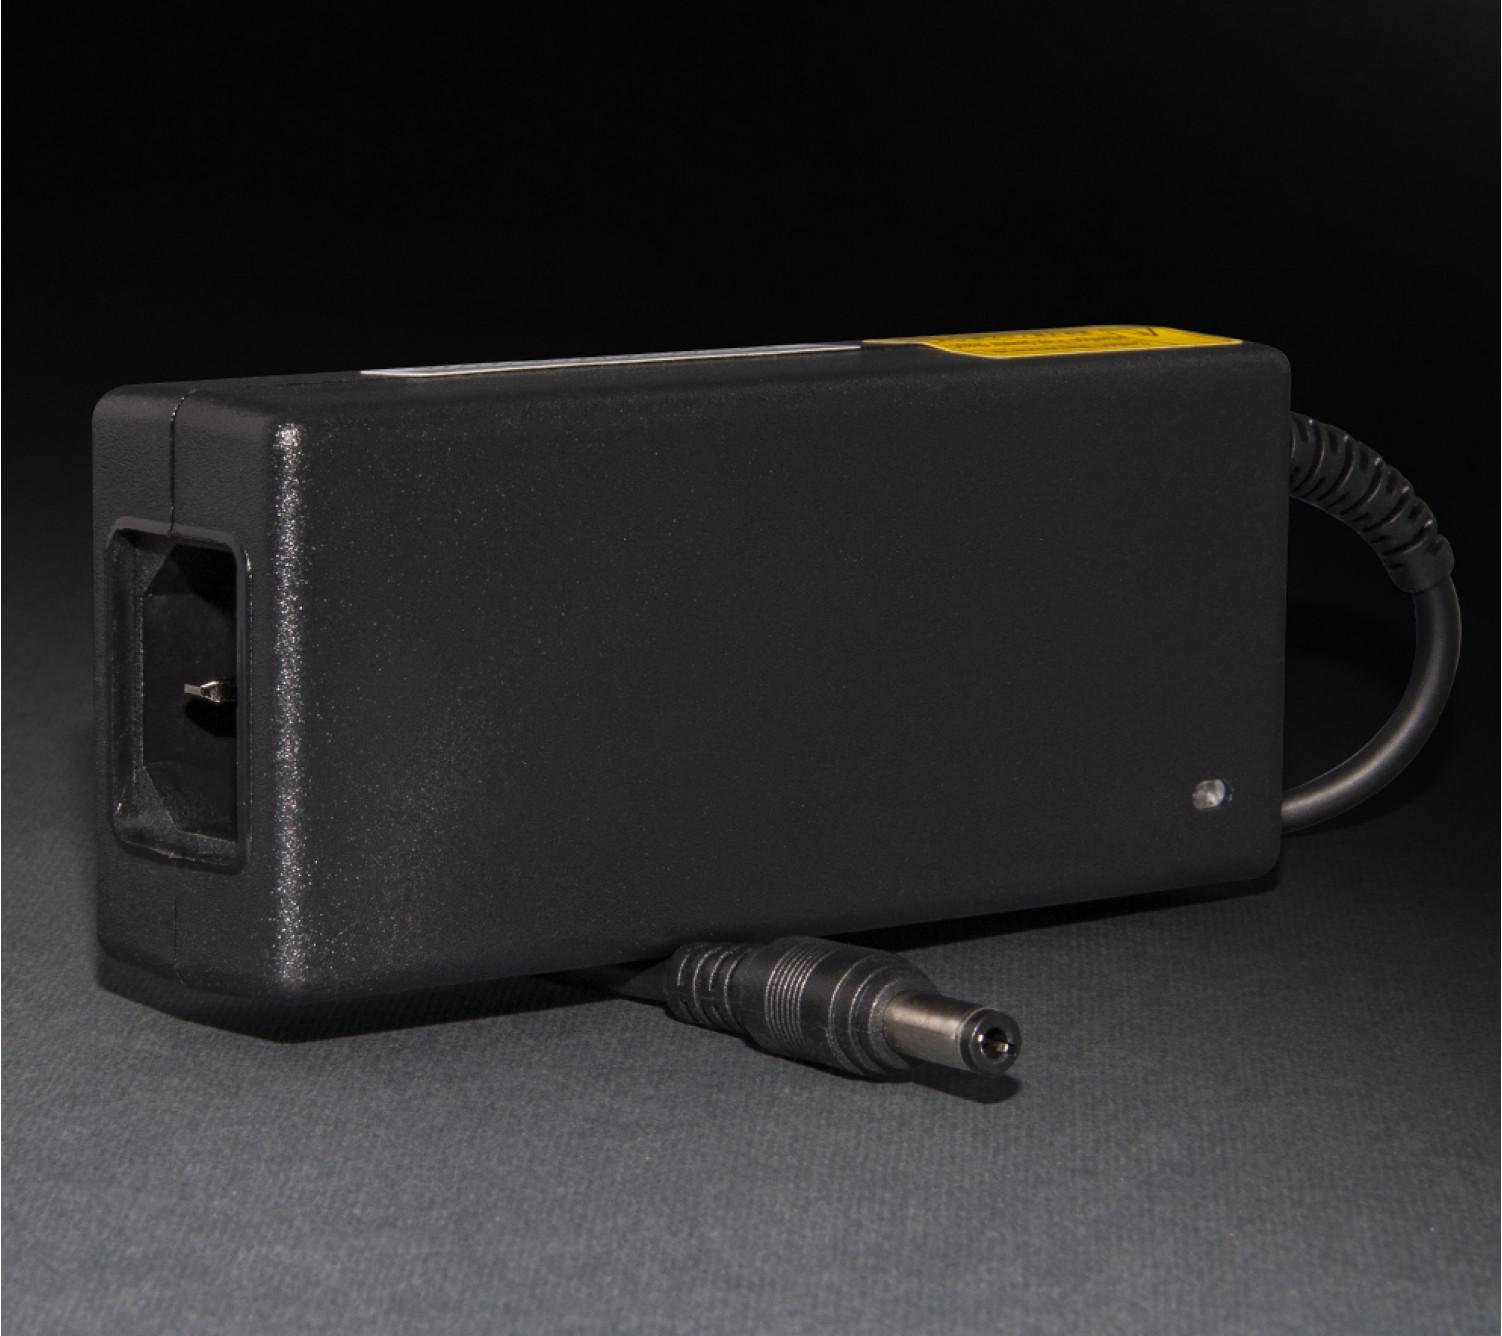 Блок питания Frime 12V 4A 48W 5.5x2.5мм(F12V4A48W_5525)